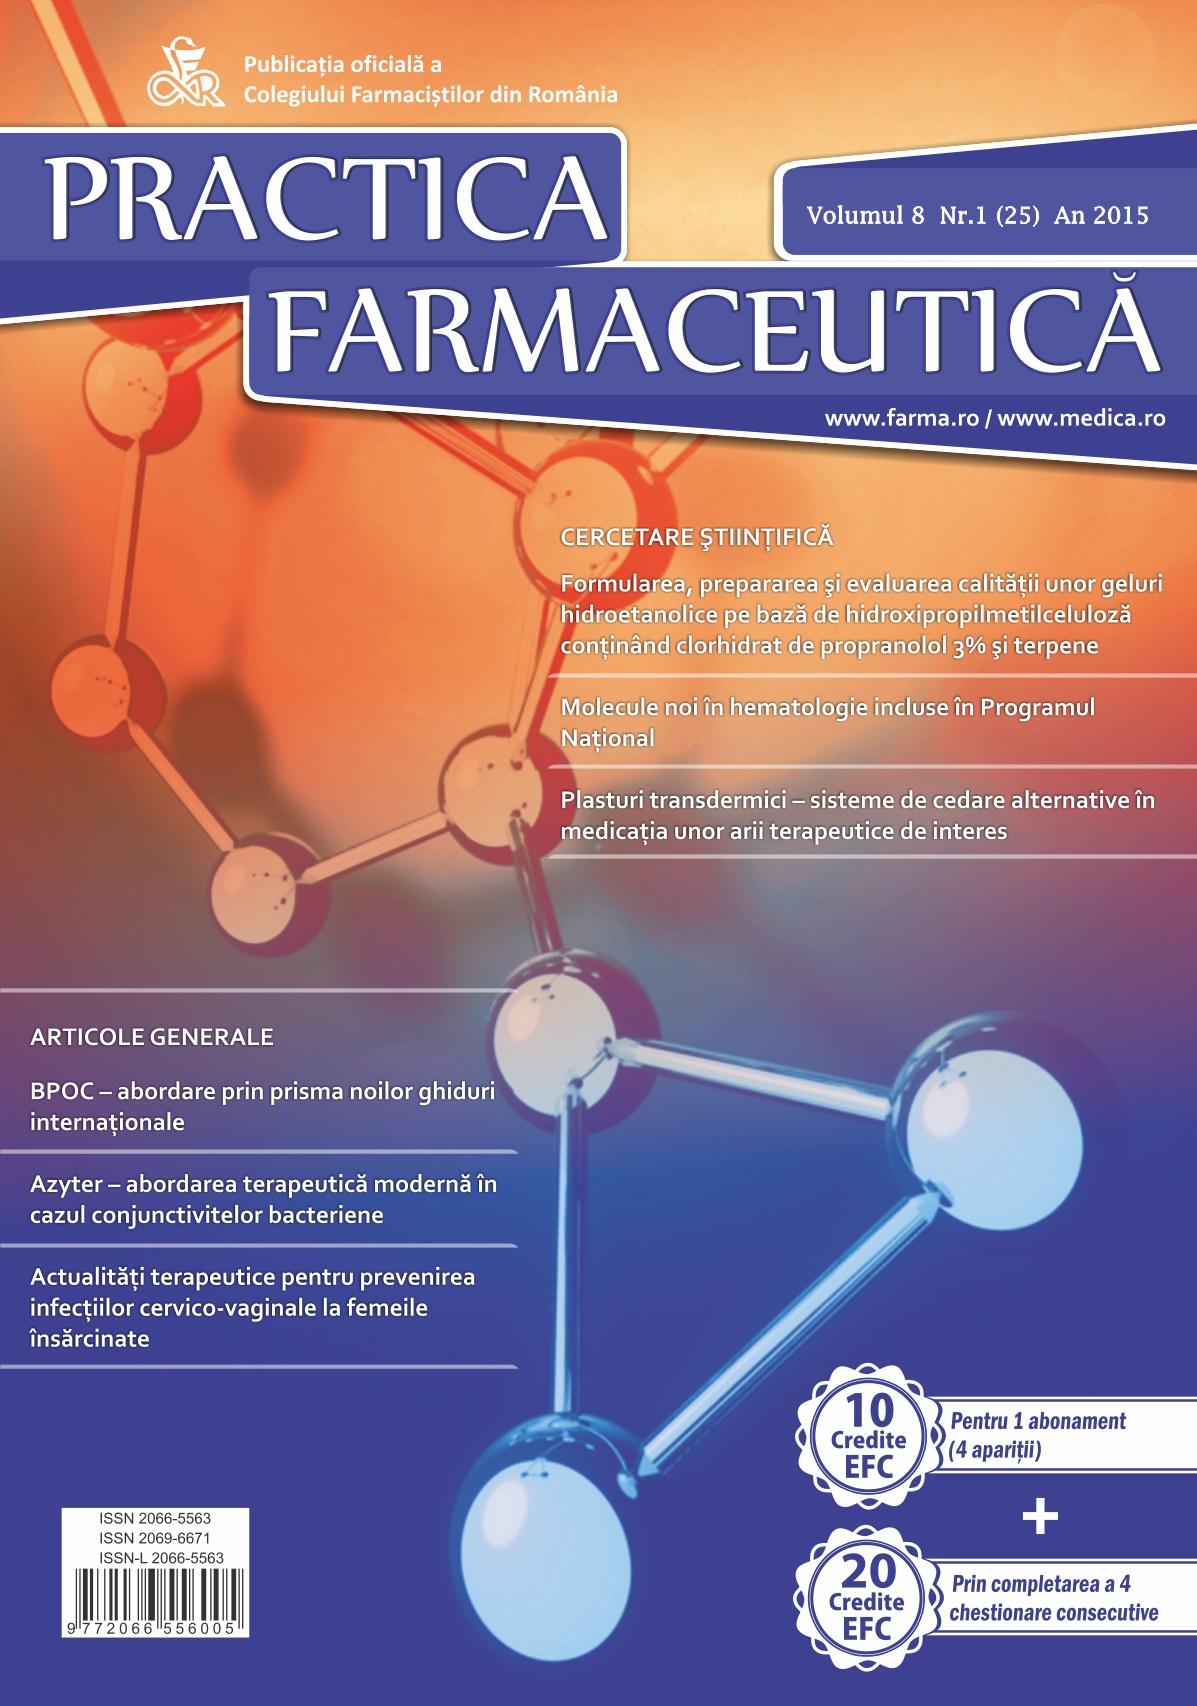 Revista Practica Farmaceutica, Vol. VIII, No. 1 (25), 2015